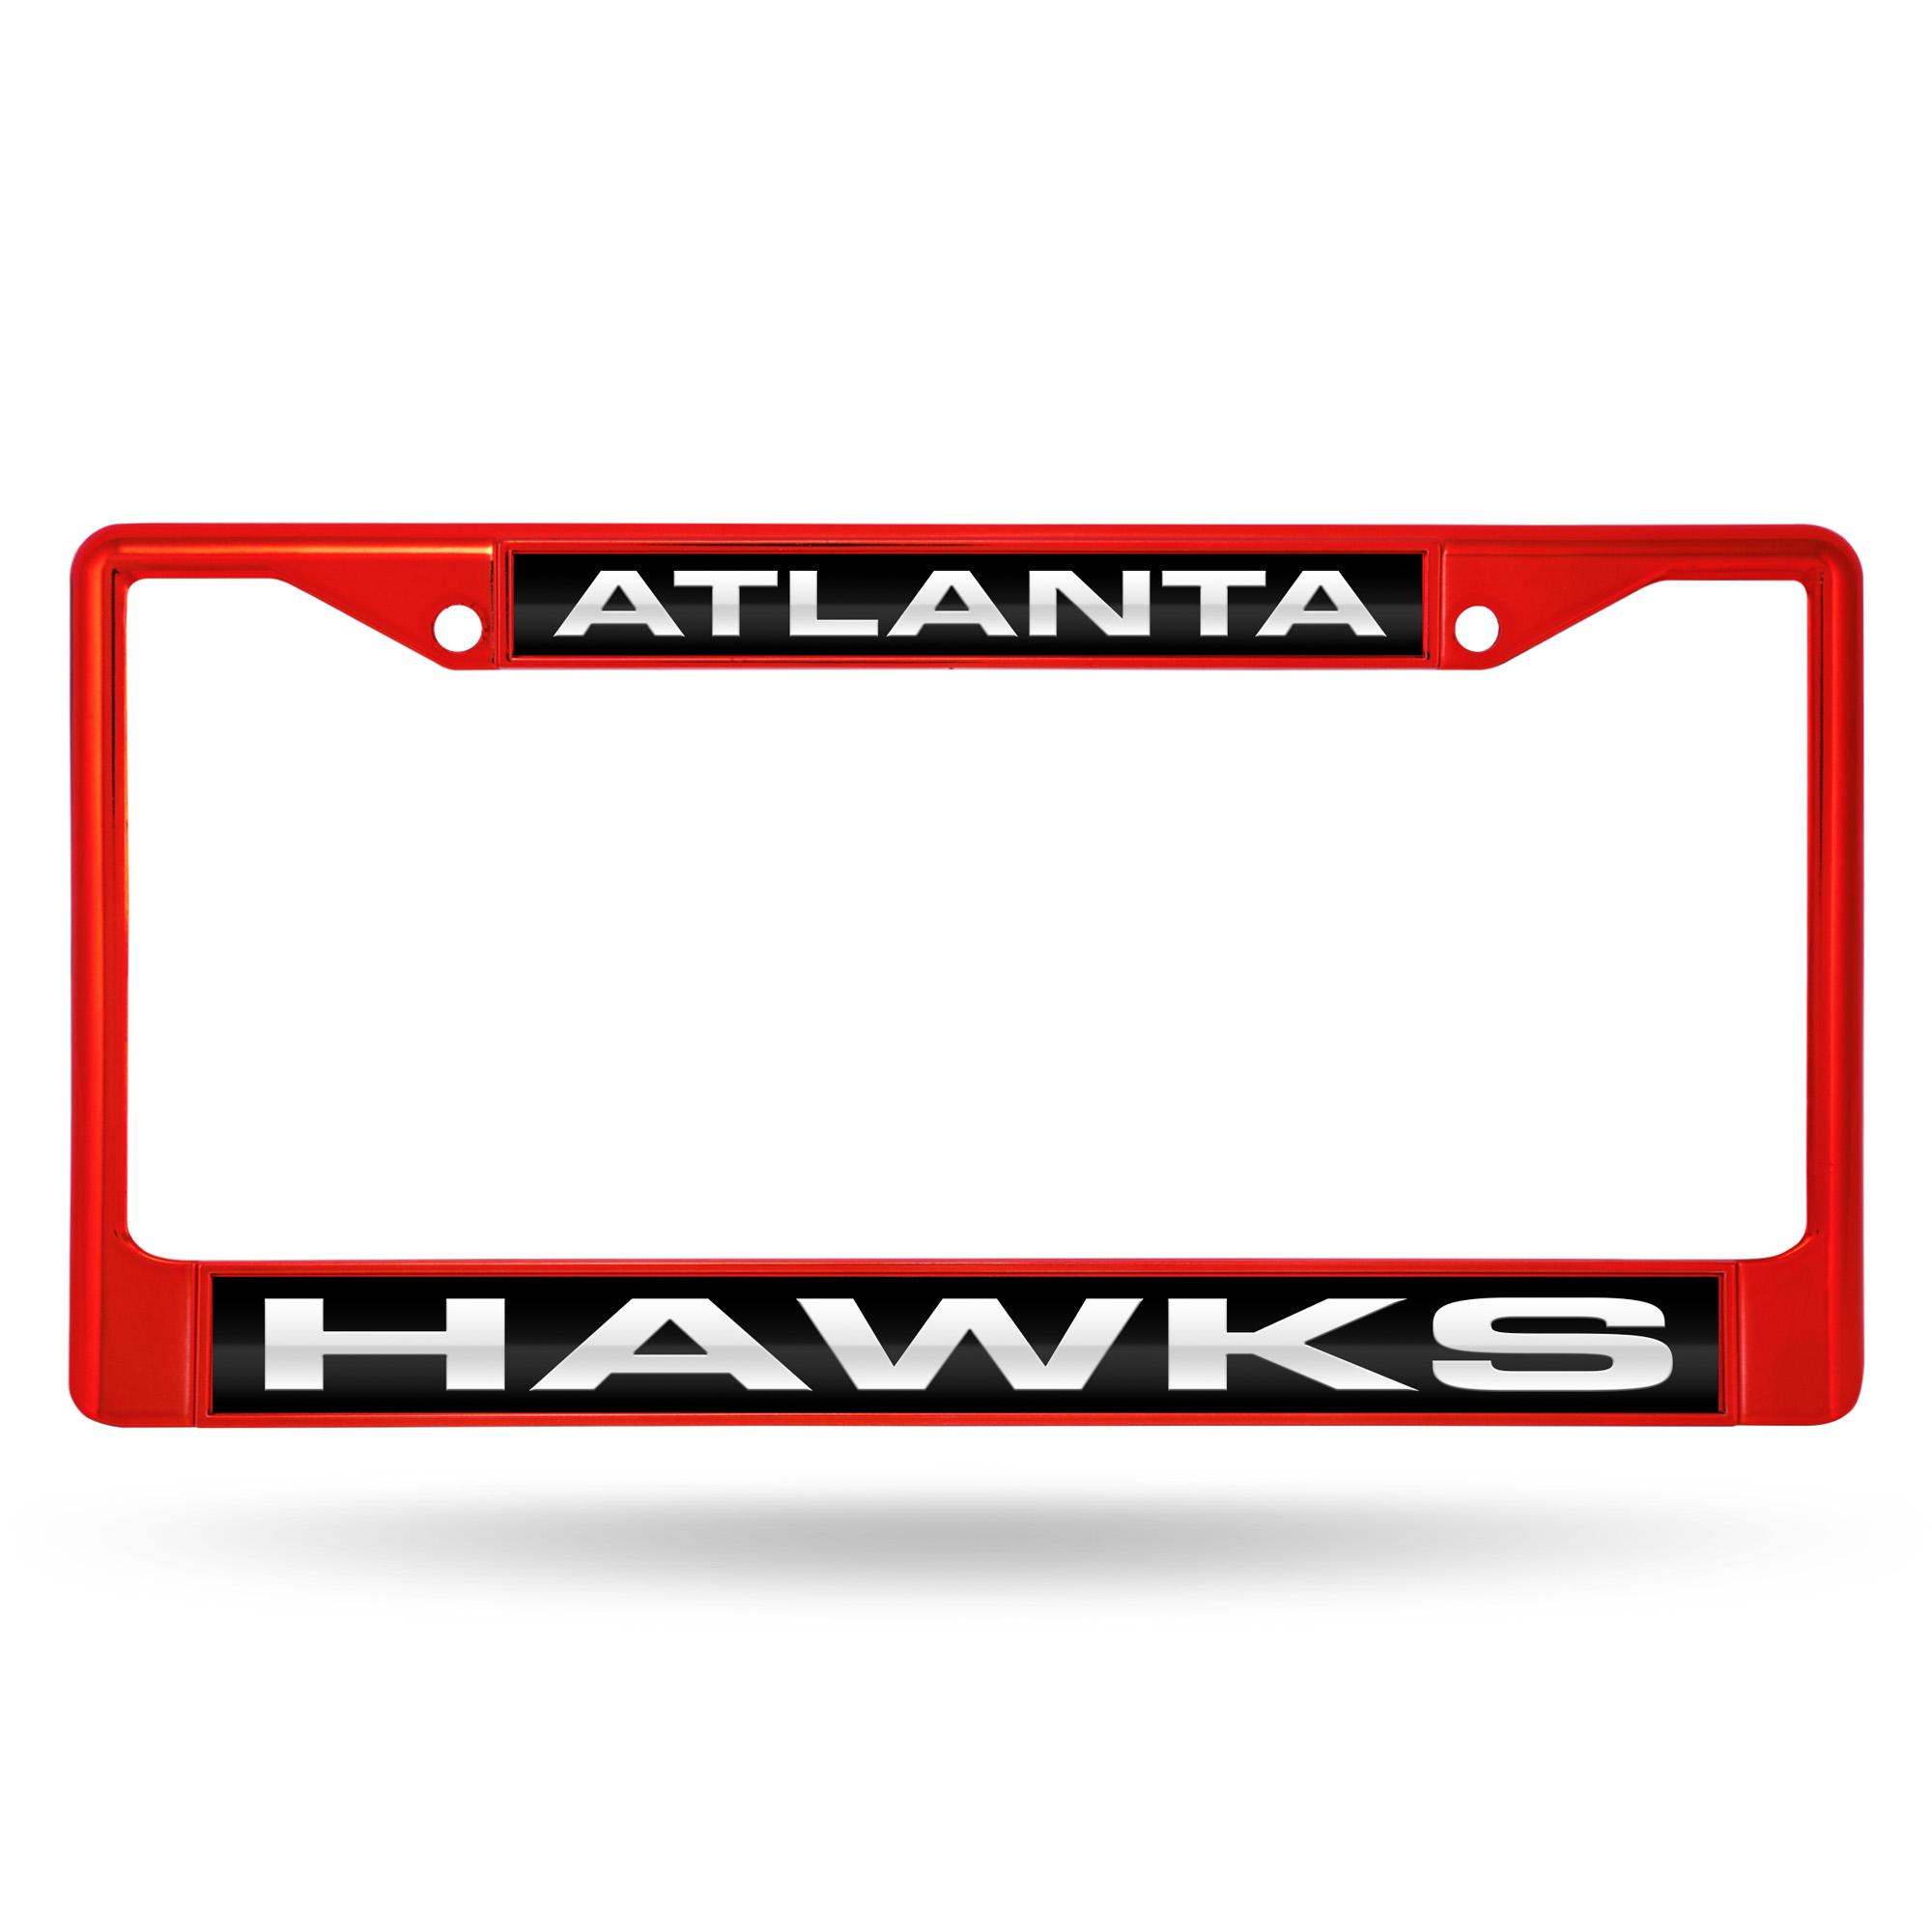 Atlanta Hawks Laser Chrome Licence Plate Frame - No Size